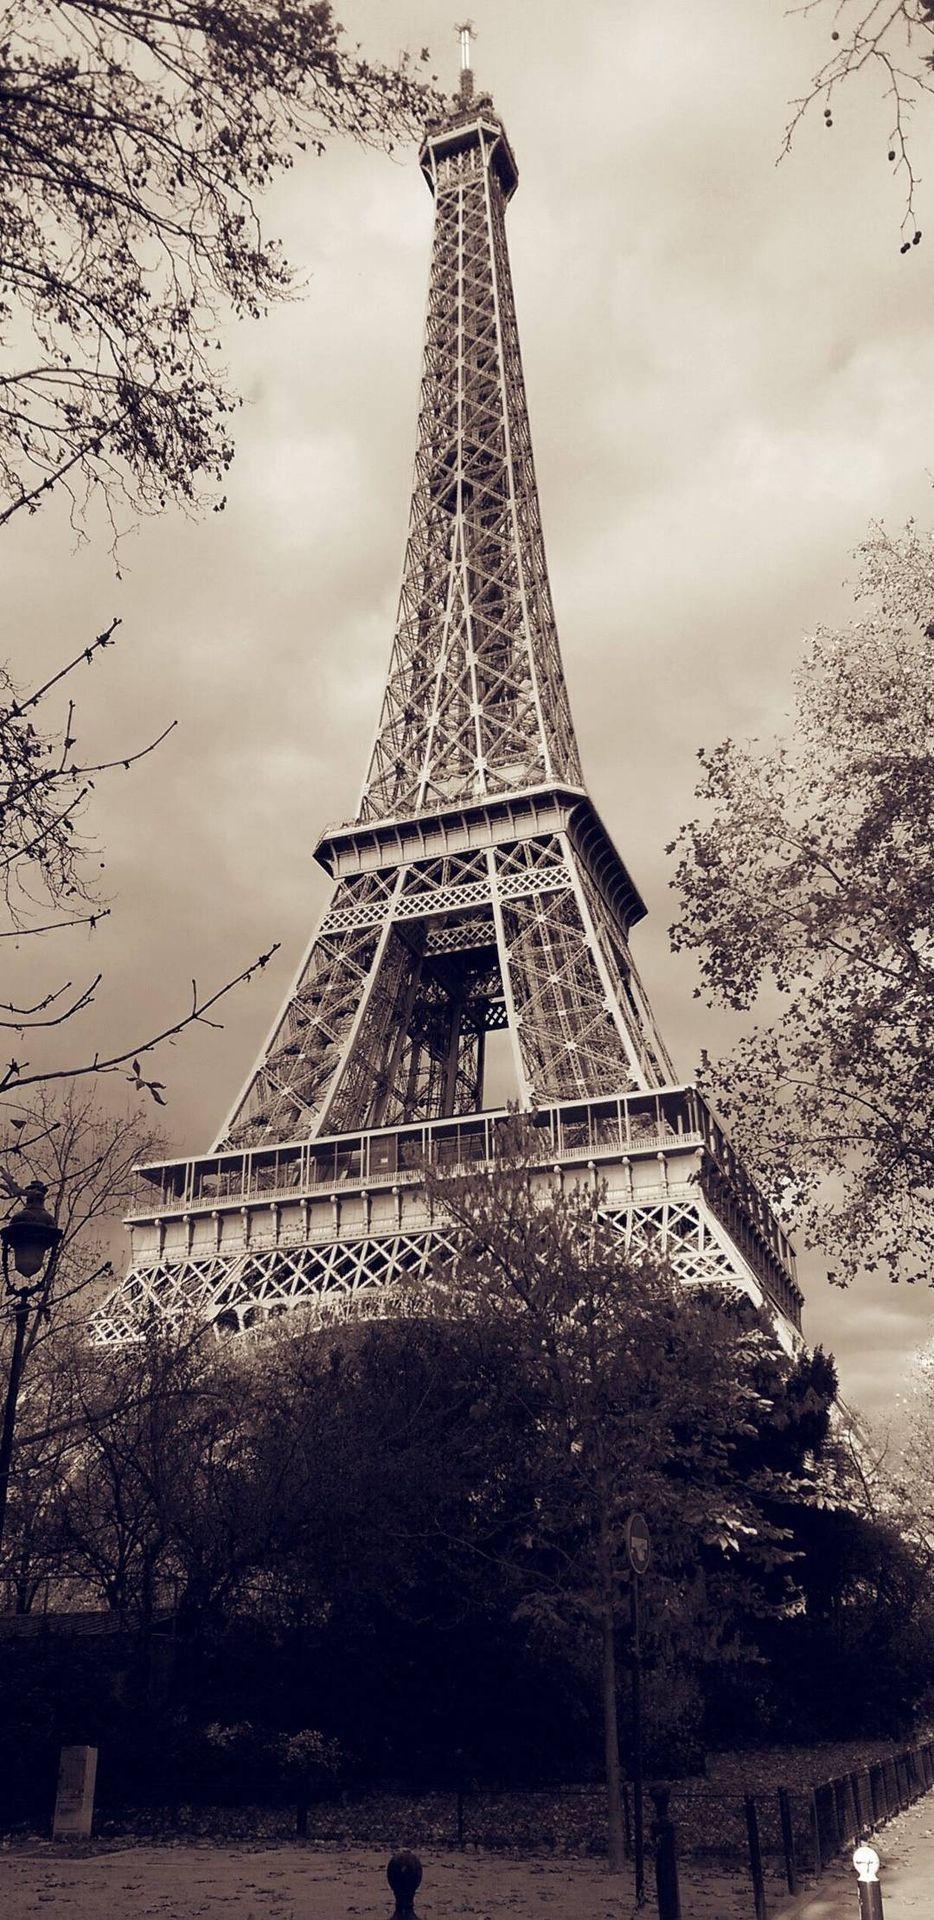 خلفيات للهاتف عادية Eiffel Tower Tour Eiffel Countries Of The World